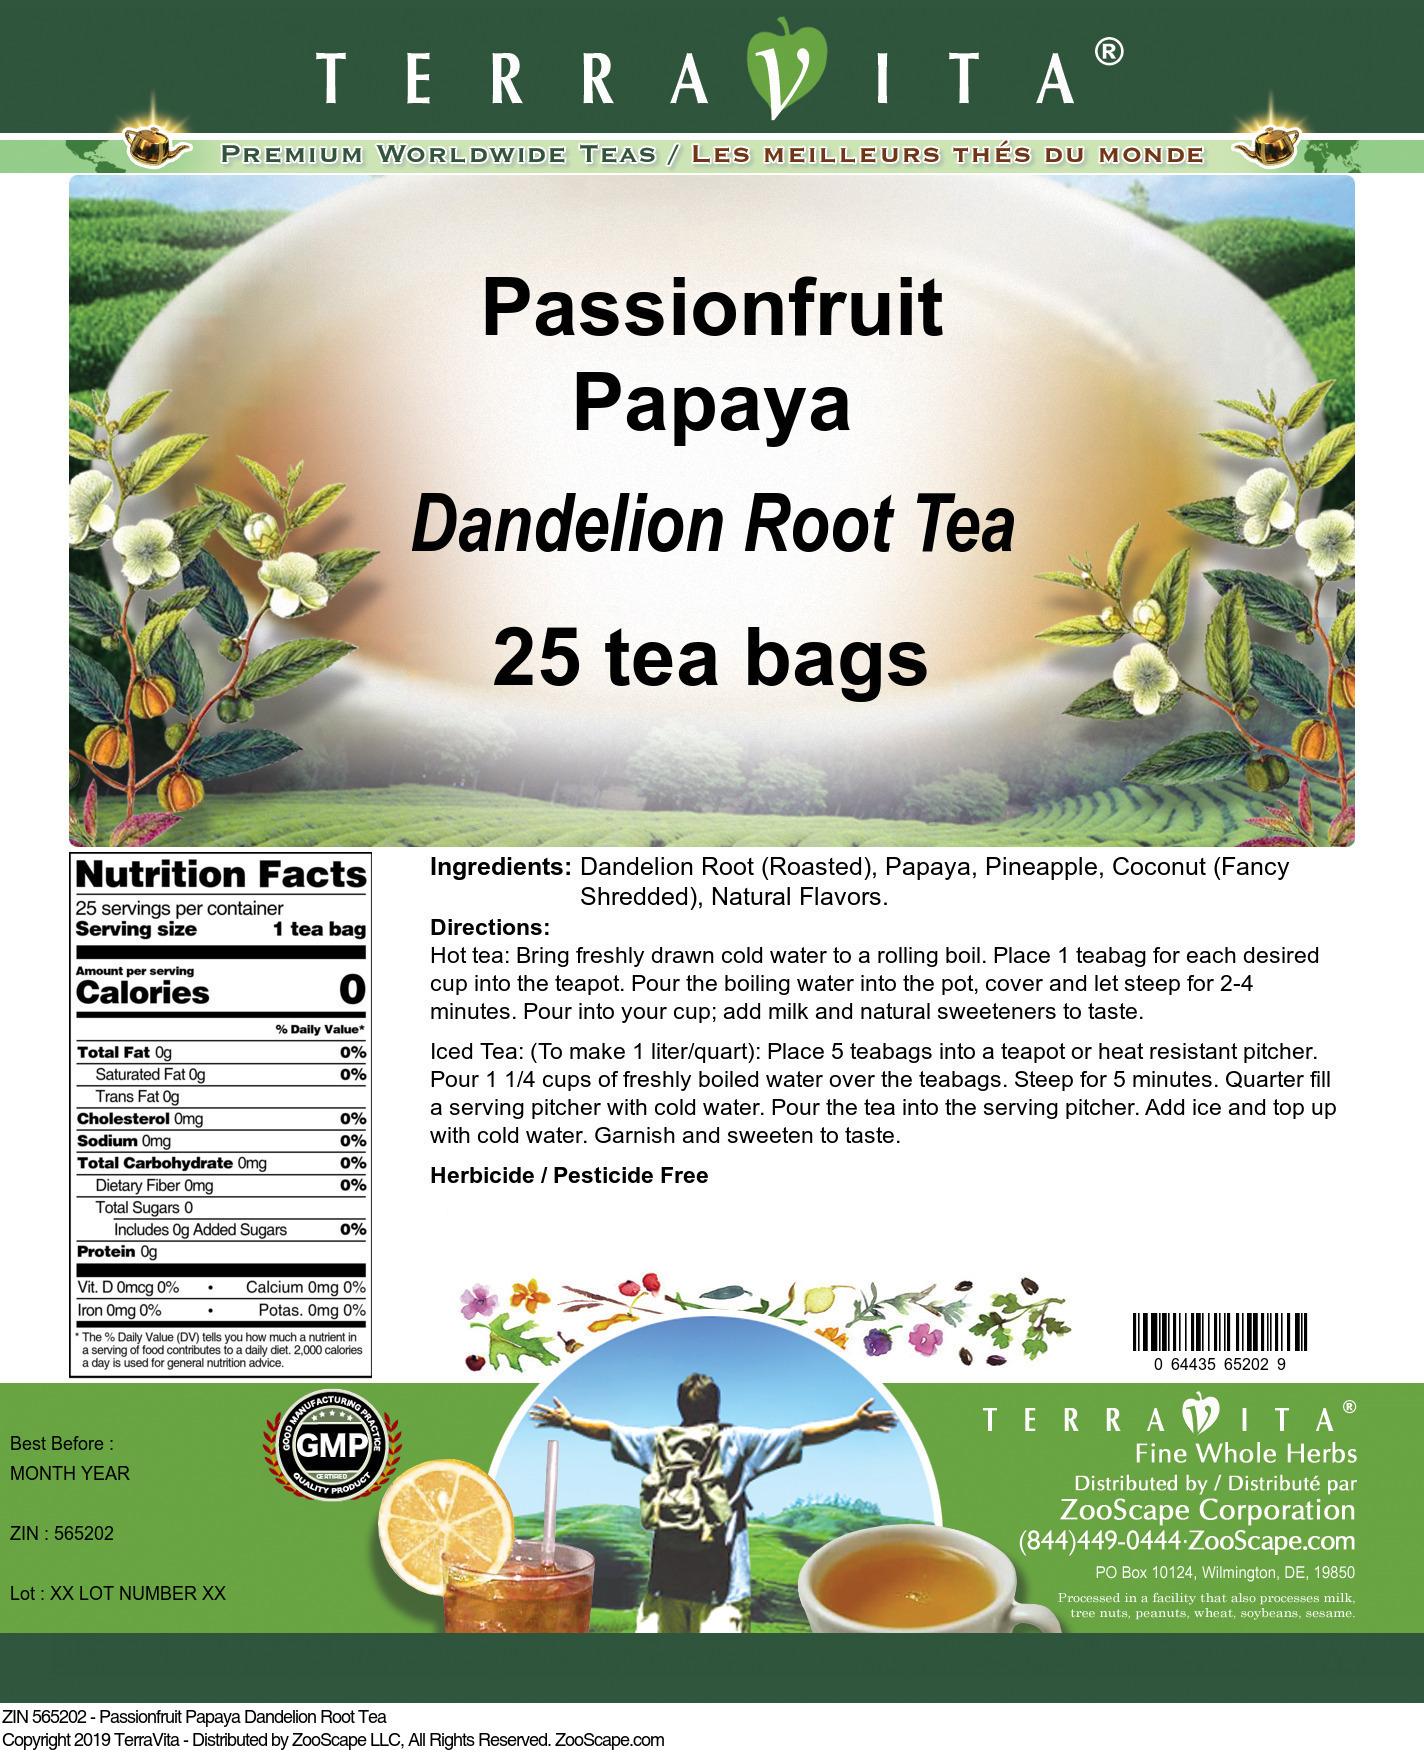 Passionfruit Papaya Dandelion Root